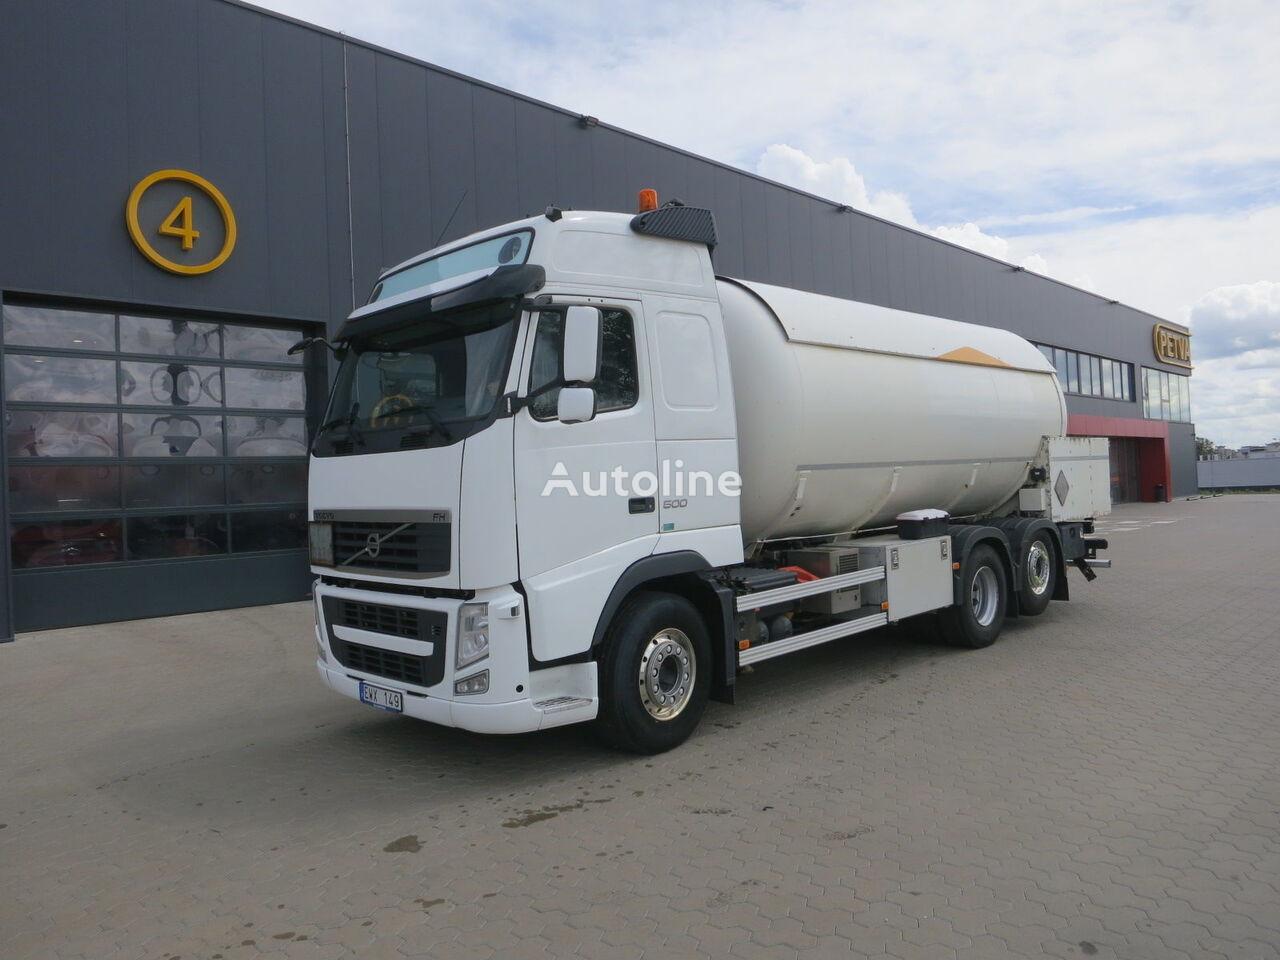 tovornjak plinska cisterna VOLVO FH 13.500, 26 000 liter. ADR